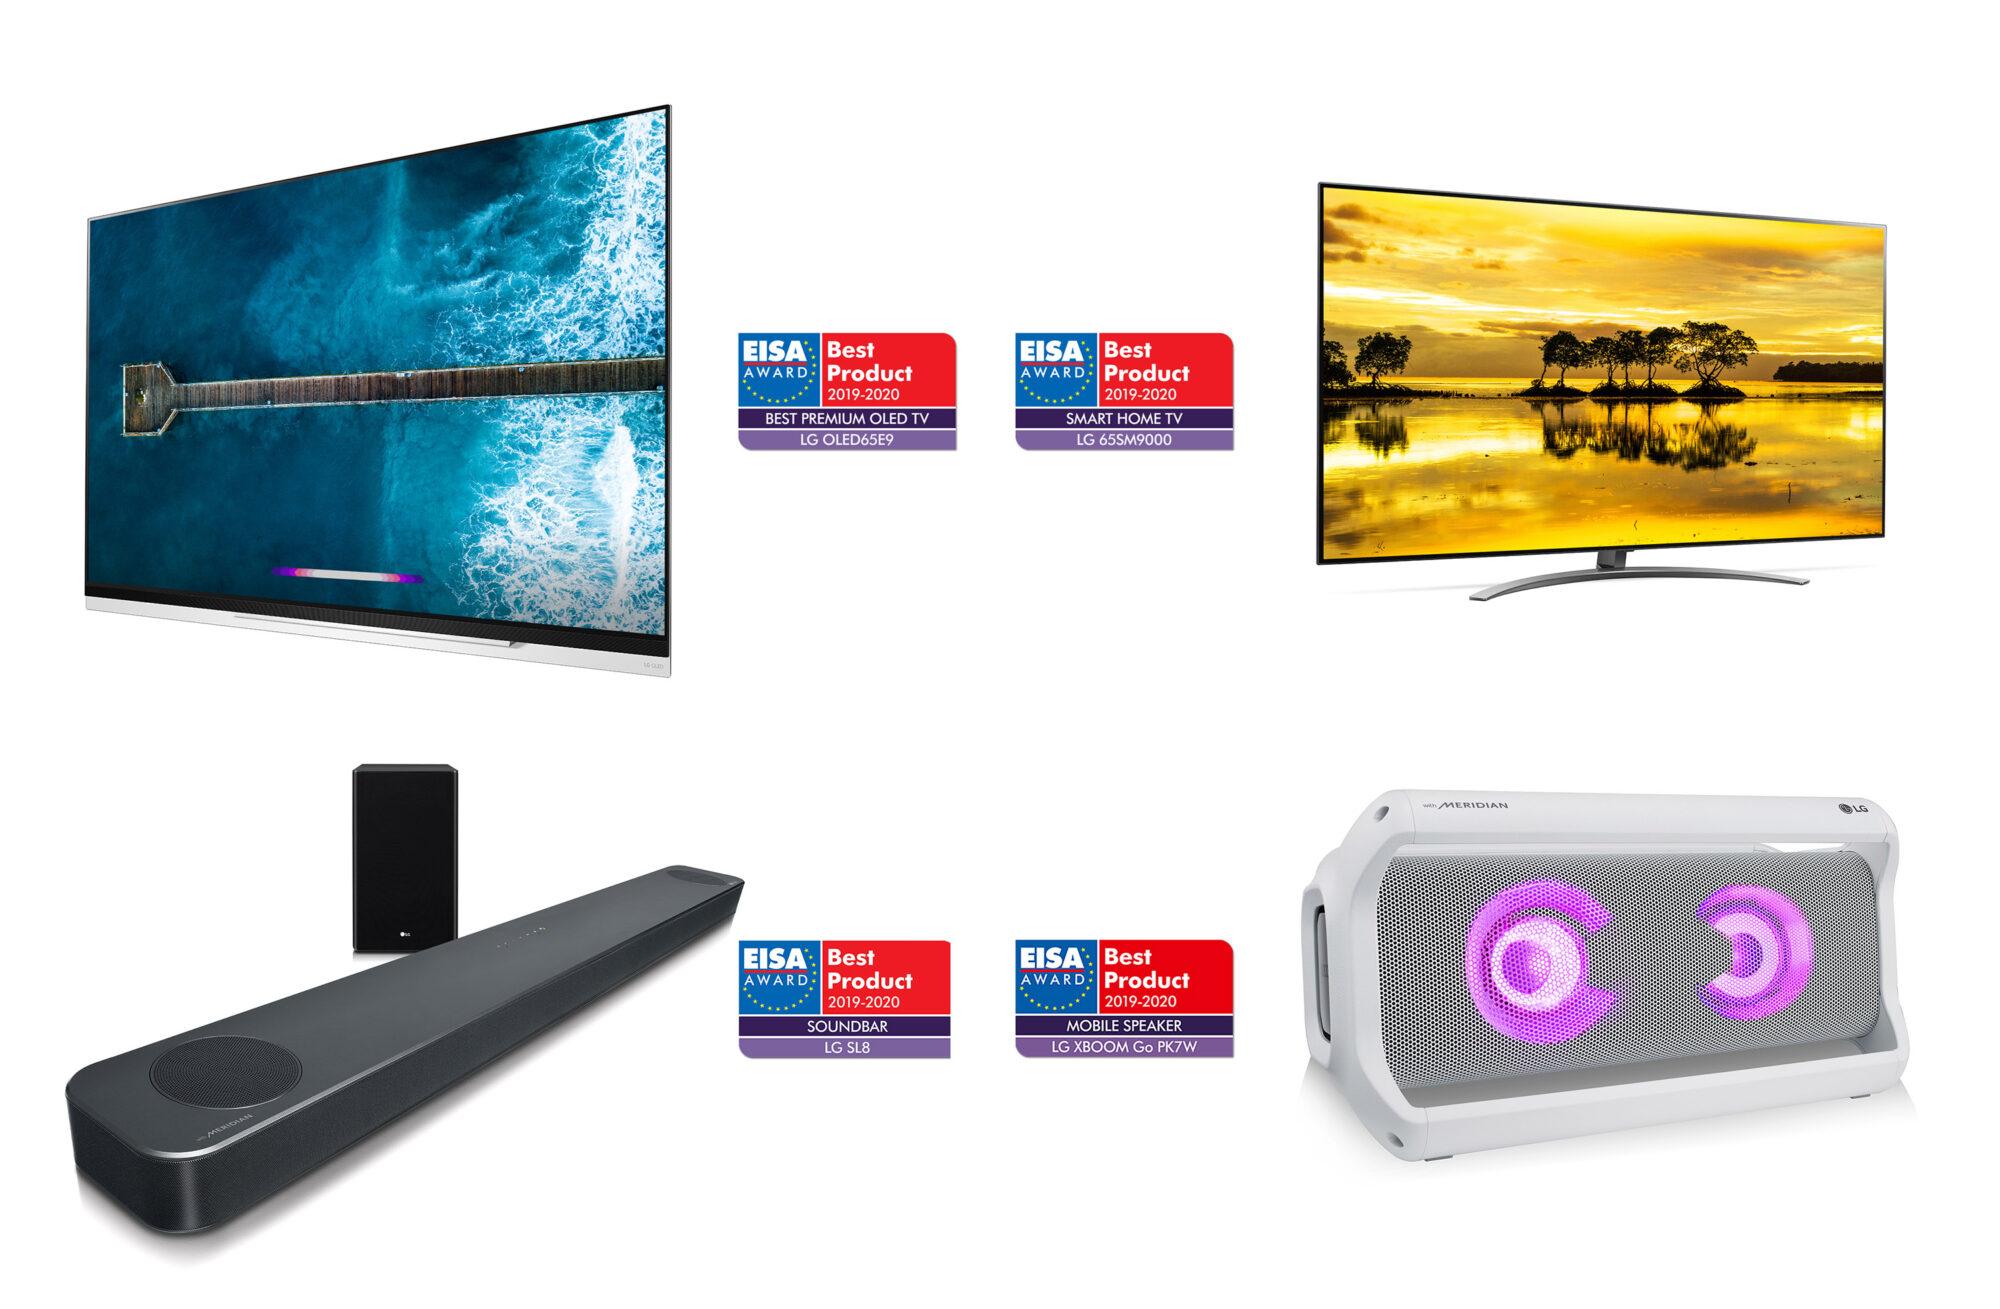 LG premiata agli EISA Awards per i prodotti di Home Entertainment thumbnail